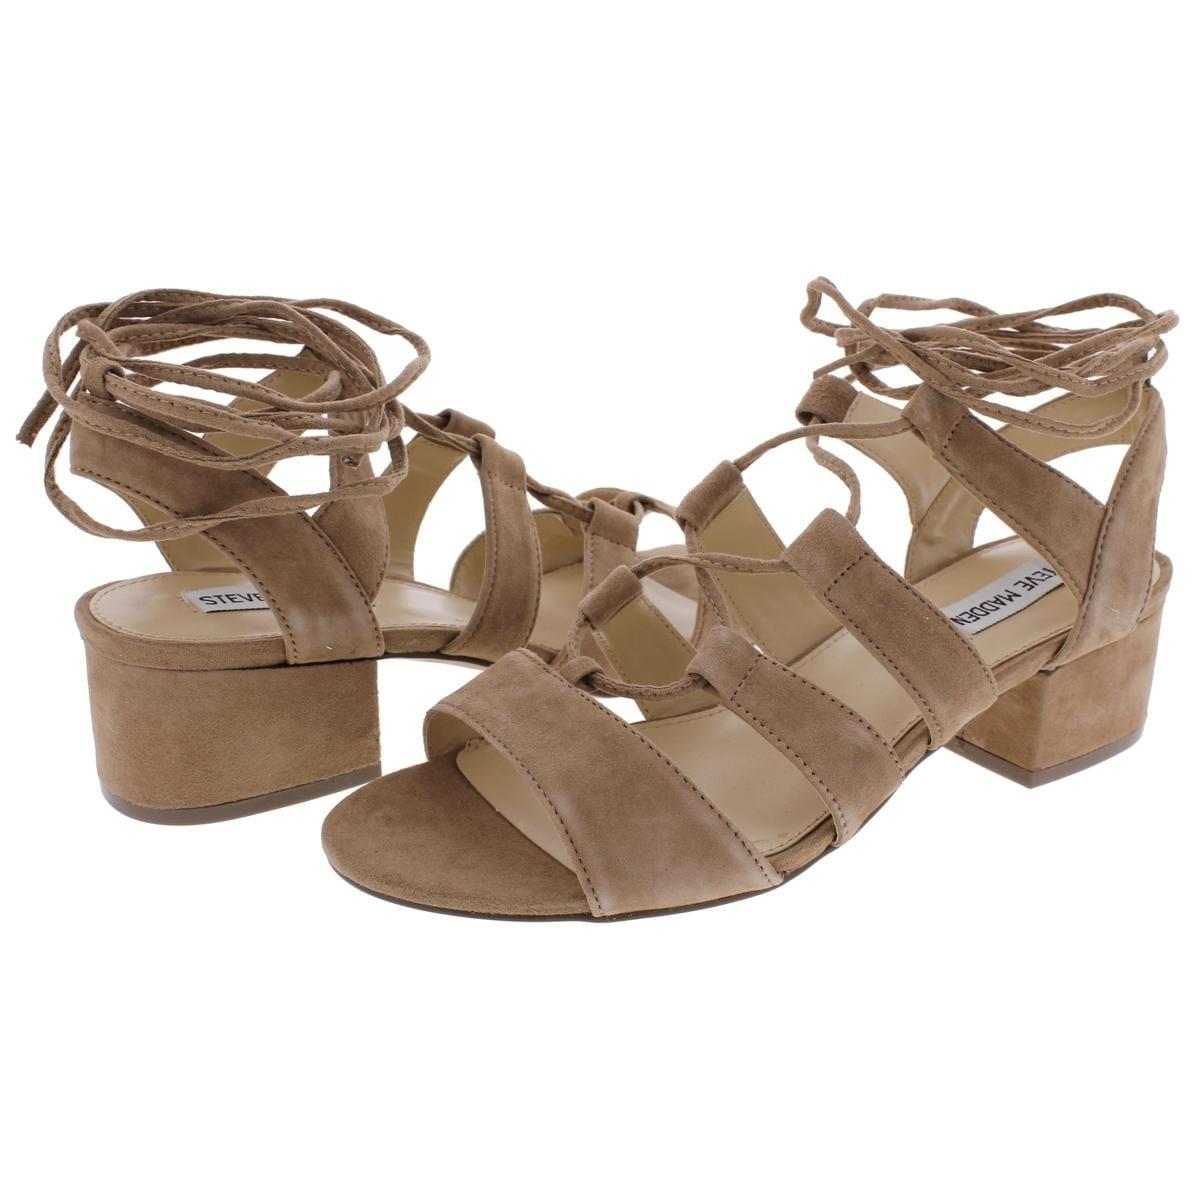 fa4d4f46e40 Steve Madden Womens Kittyy Dress Sandals Open Toe Block Heel